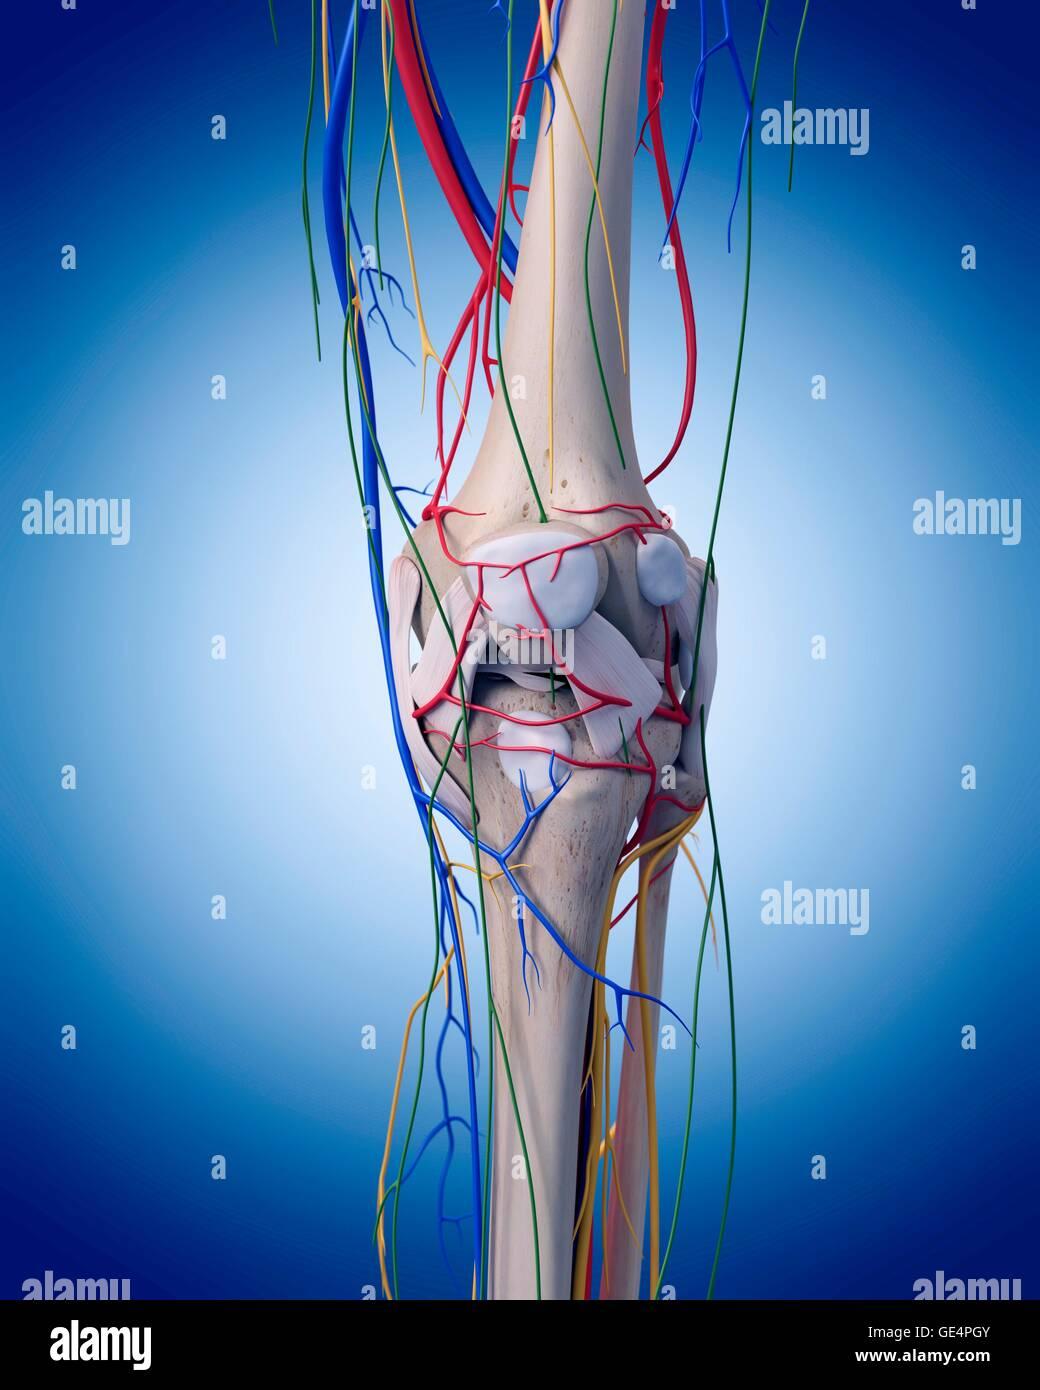 Leg Arteries Imágenes De Stock & Leg Arteries Fotos De Stock - Alamy